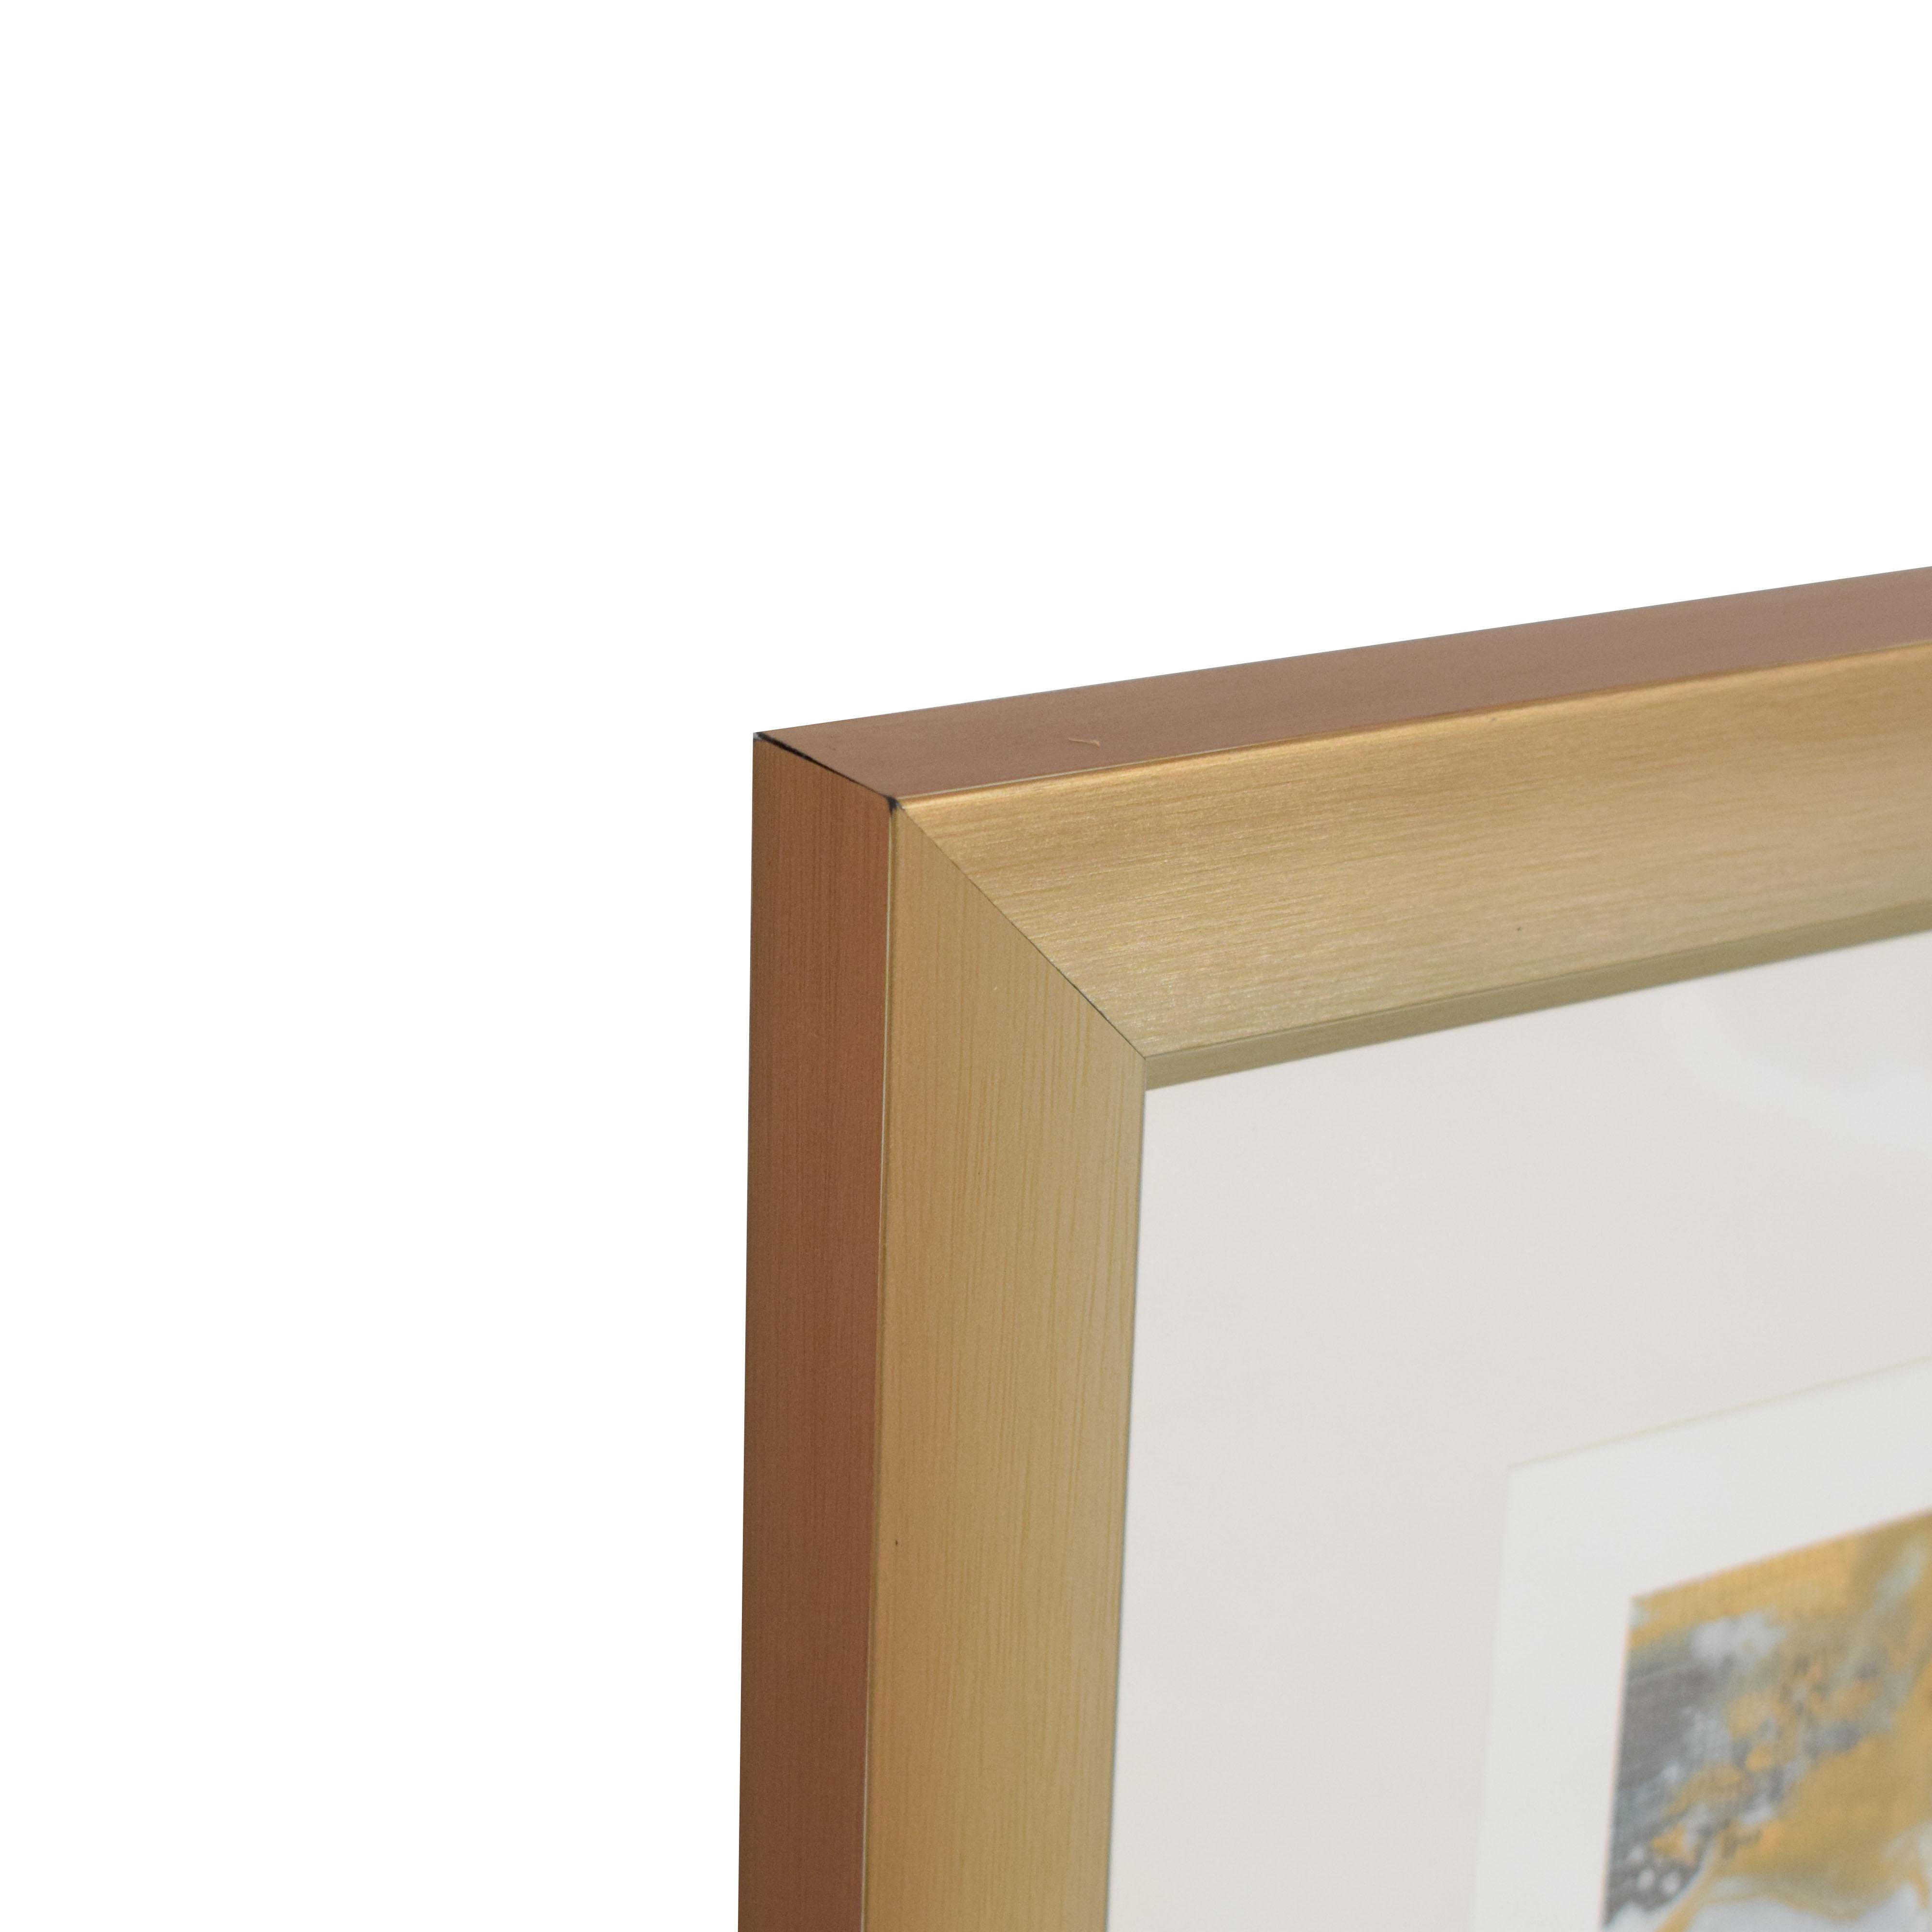 Z Gallerie Z Gallerie Ferdoz Maleki Journey to the Unknown Wall Art price